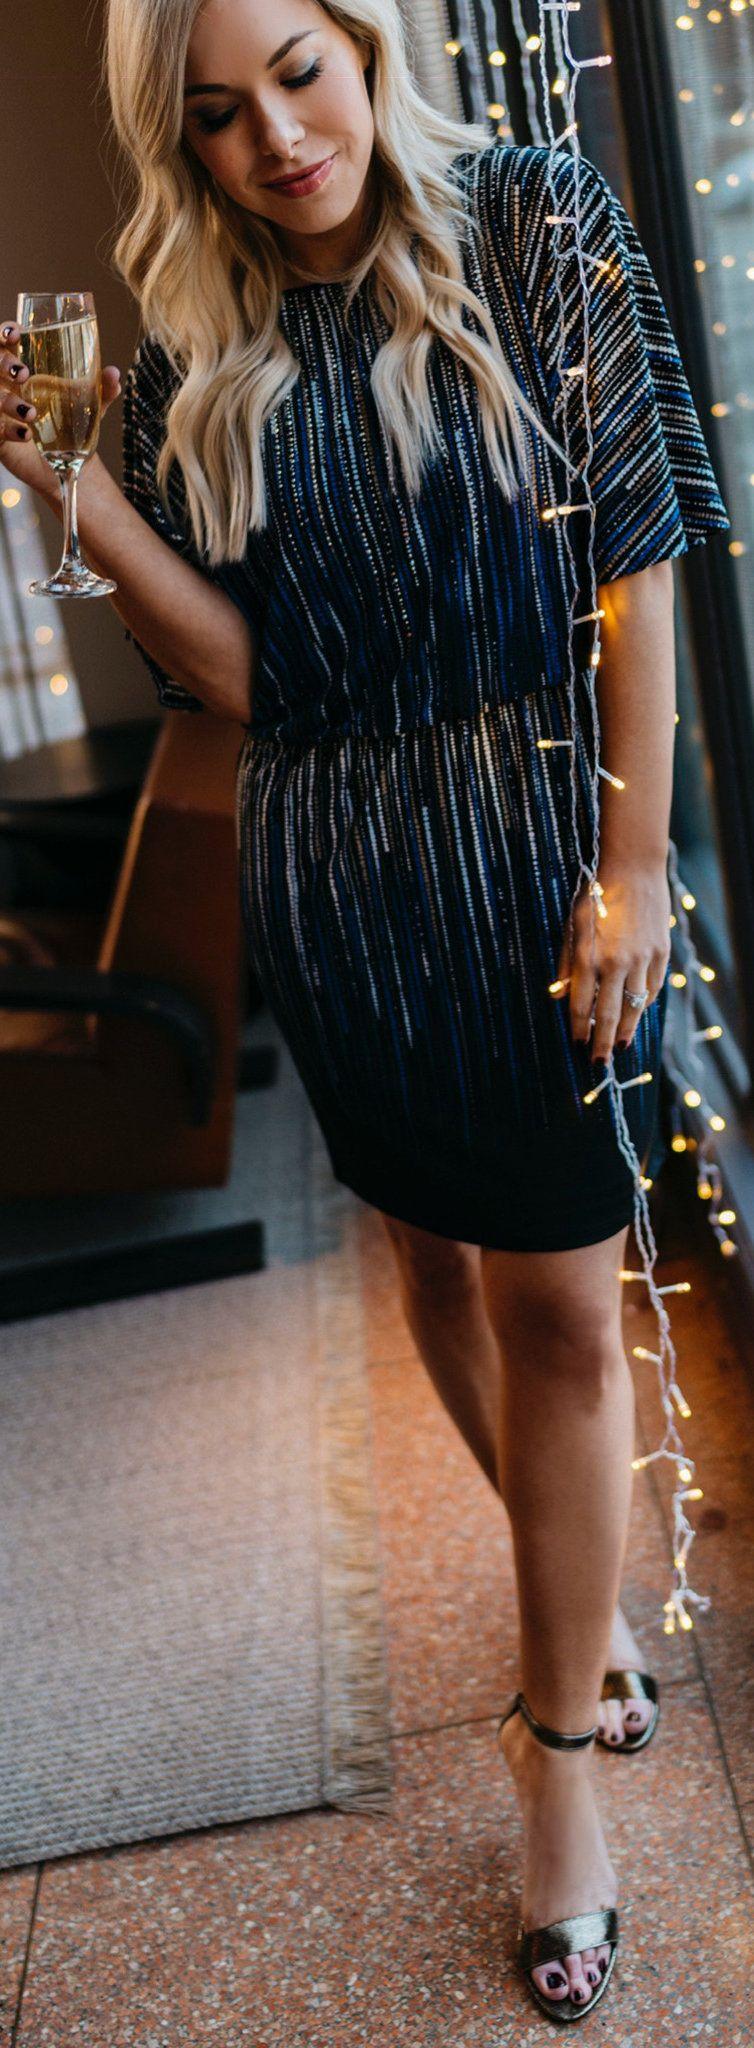 black elbow-sleeved mini dress